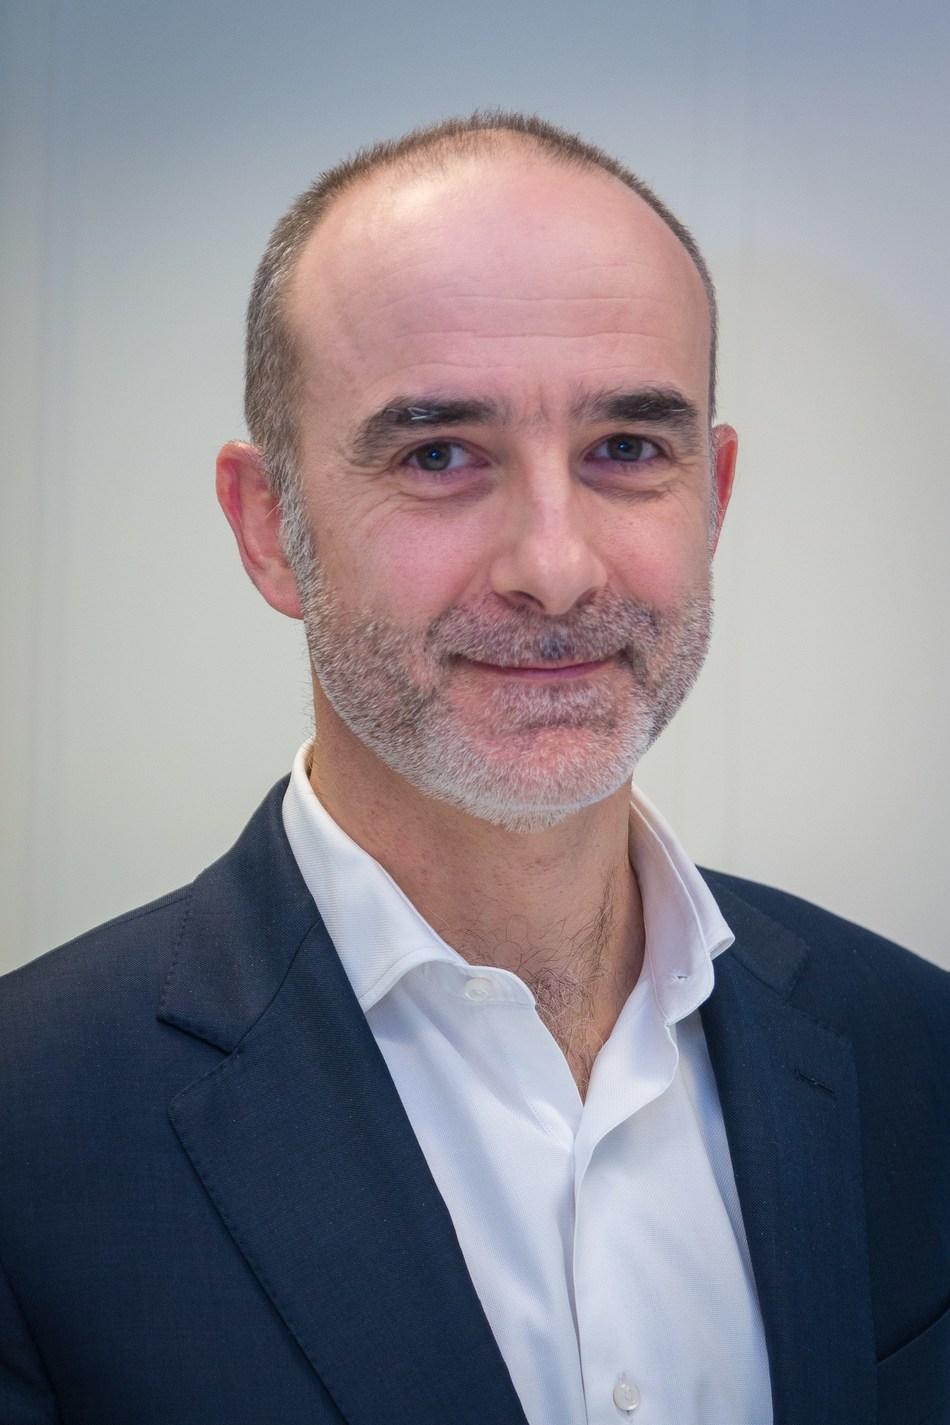 Luc Querton, CEO of Altares Group (PRNewsfoto/Altares)